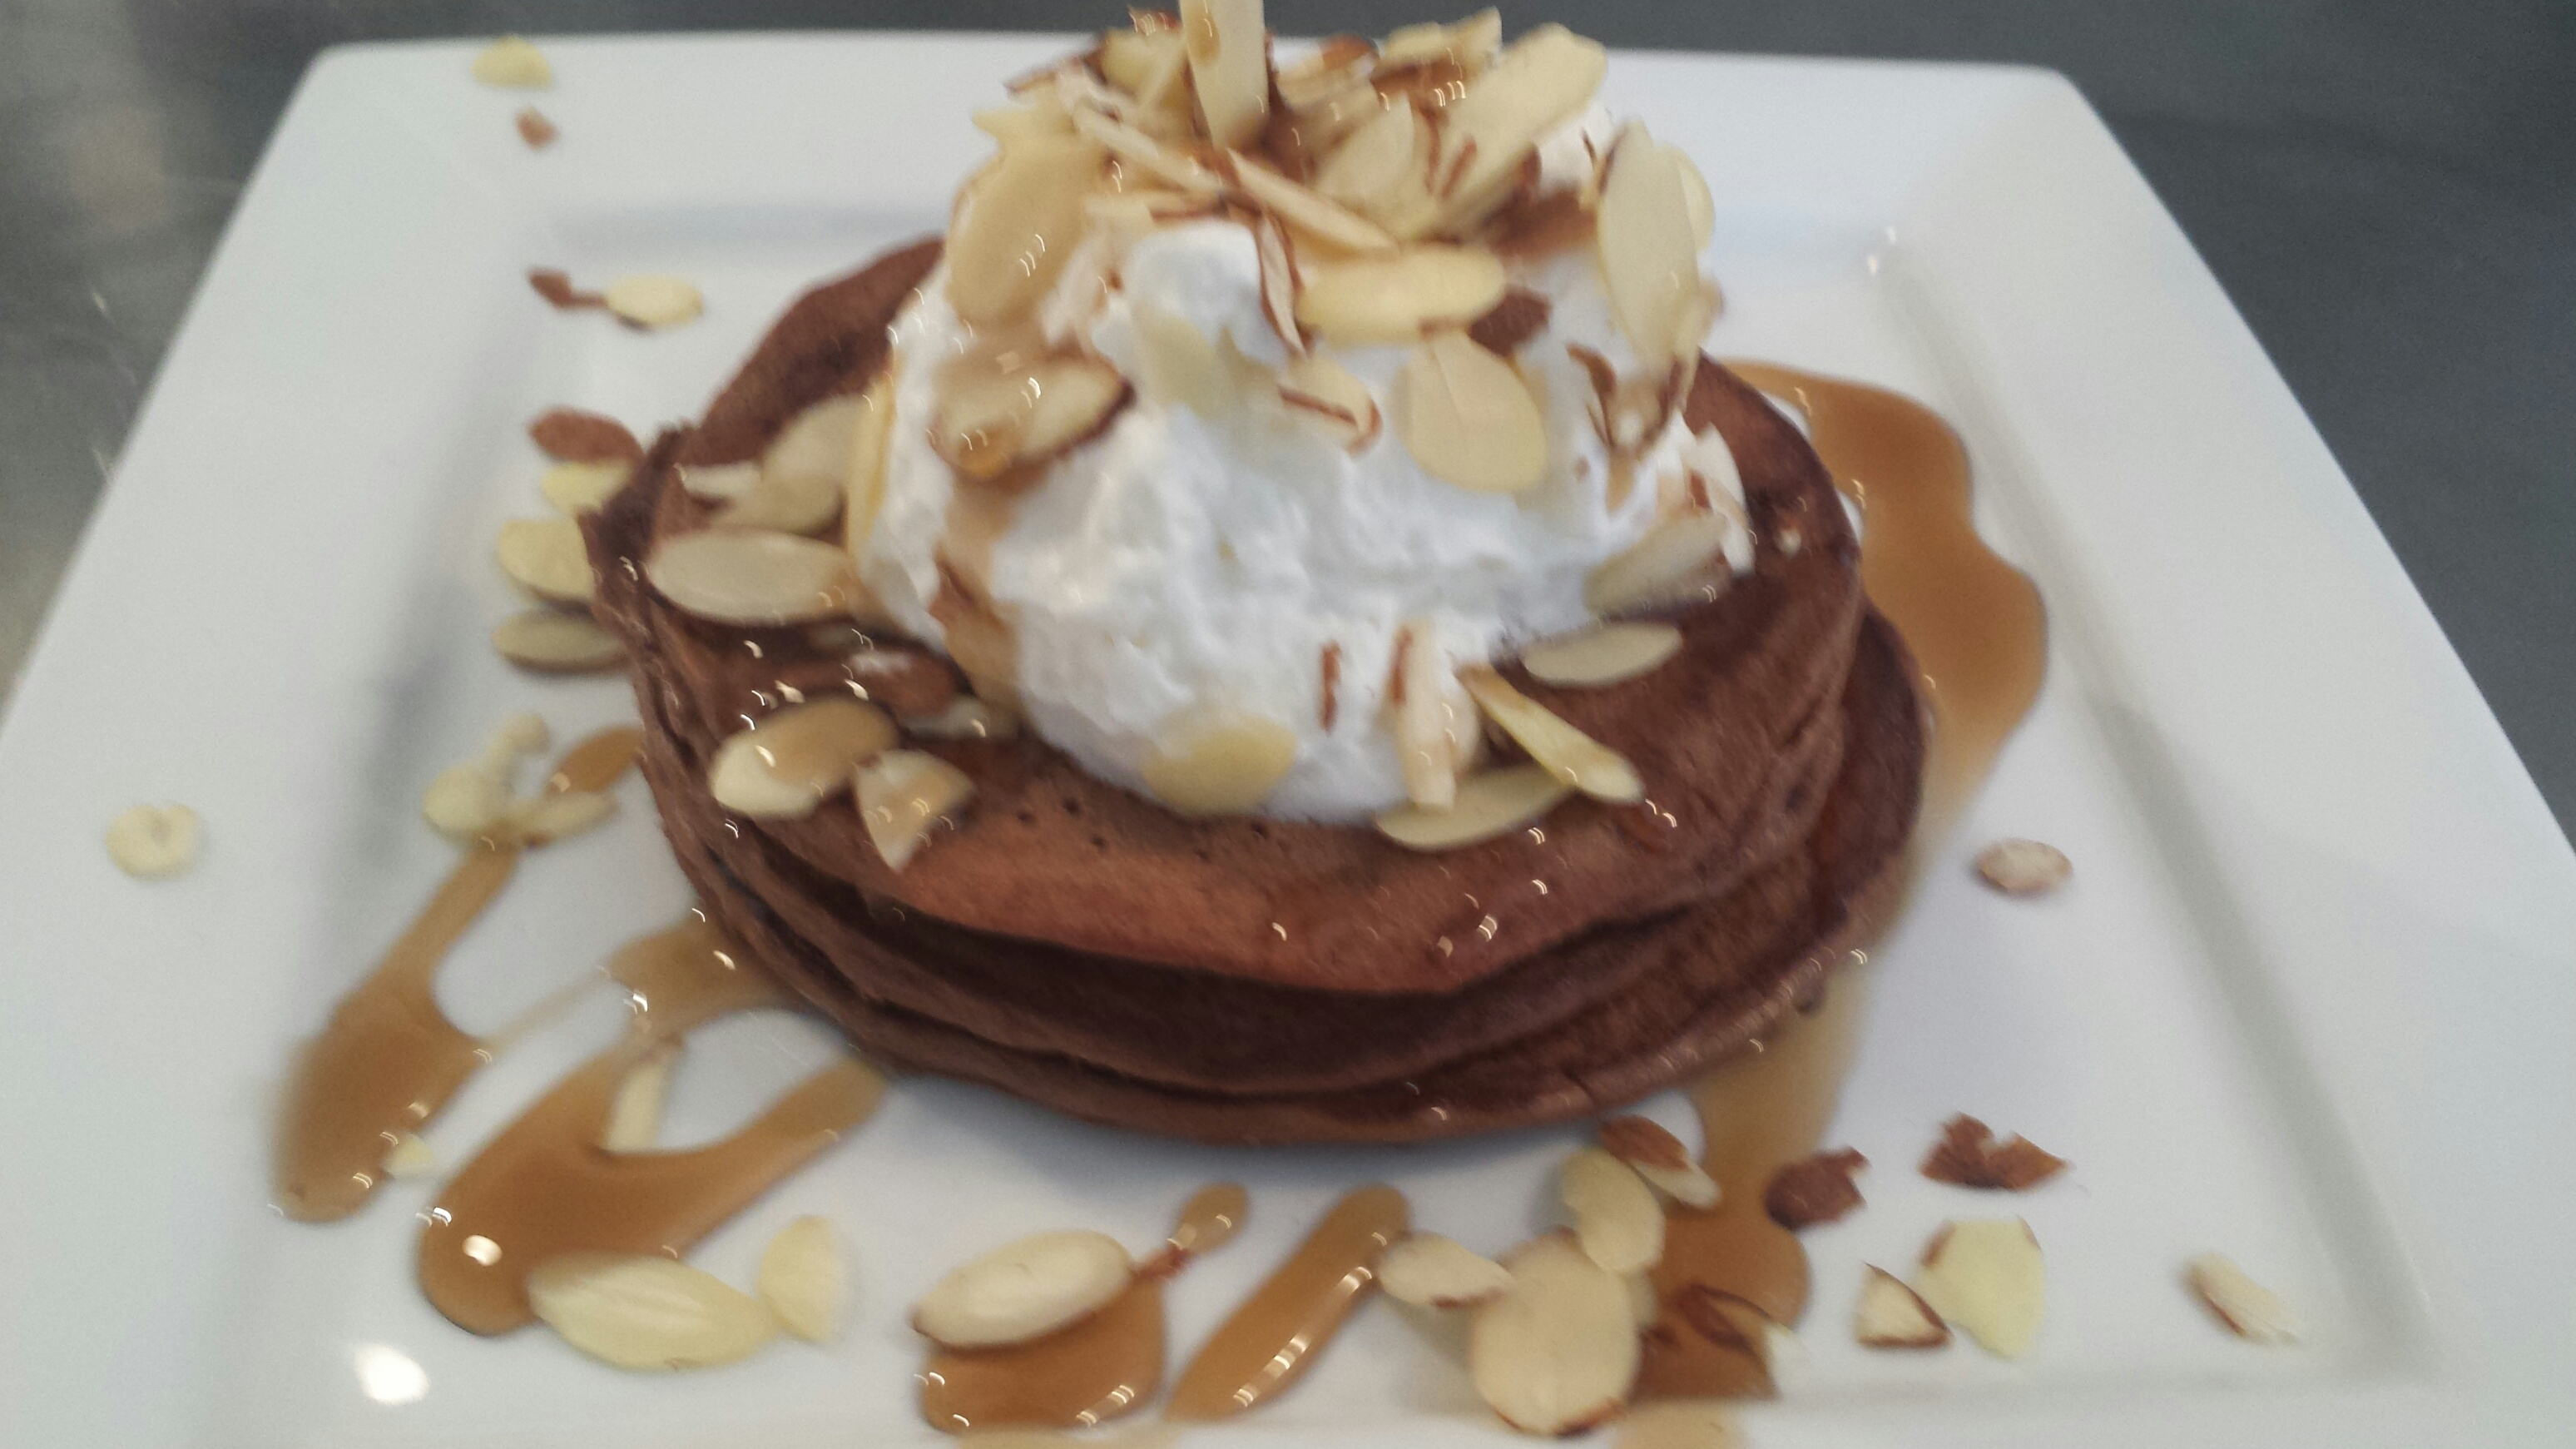 Chocolate Pancakes! Need I say more….yum! Enjoy!